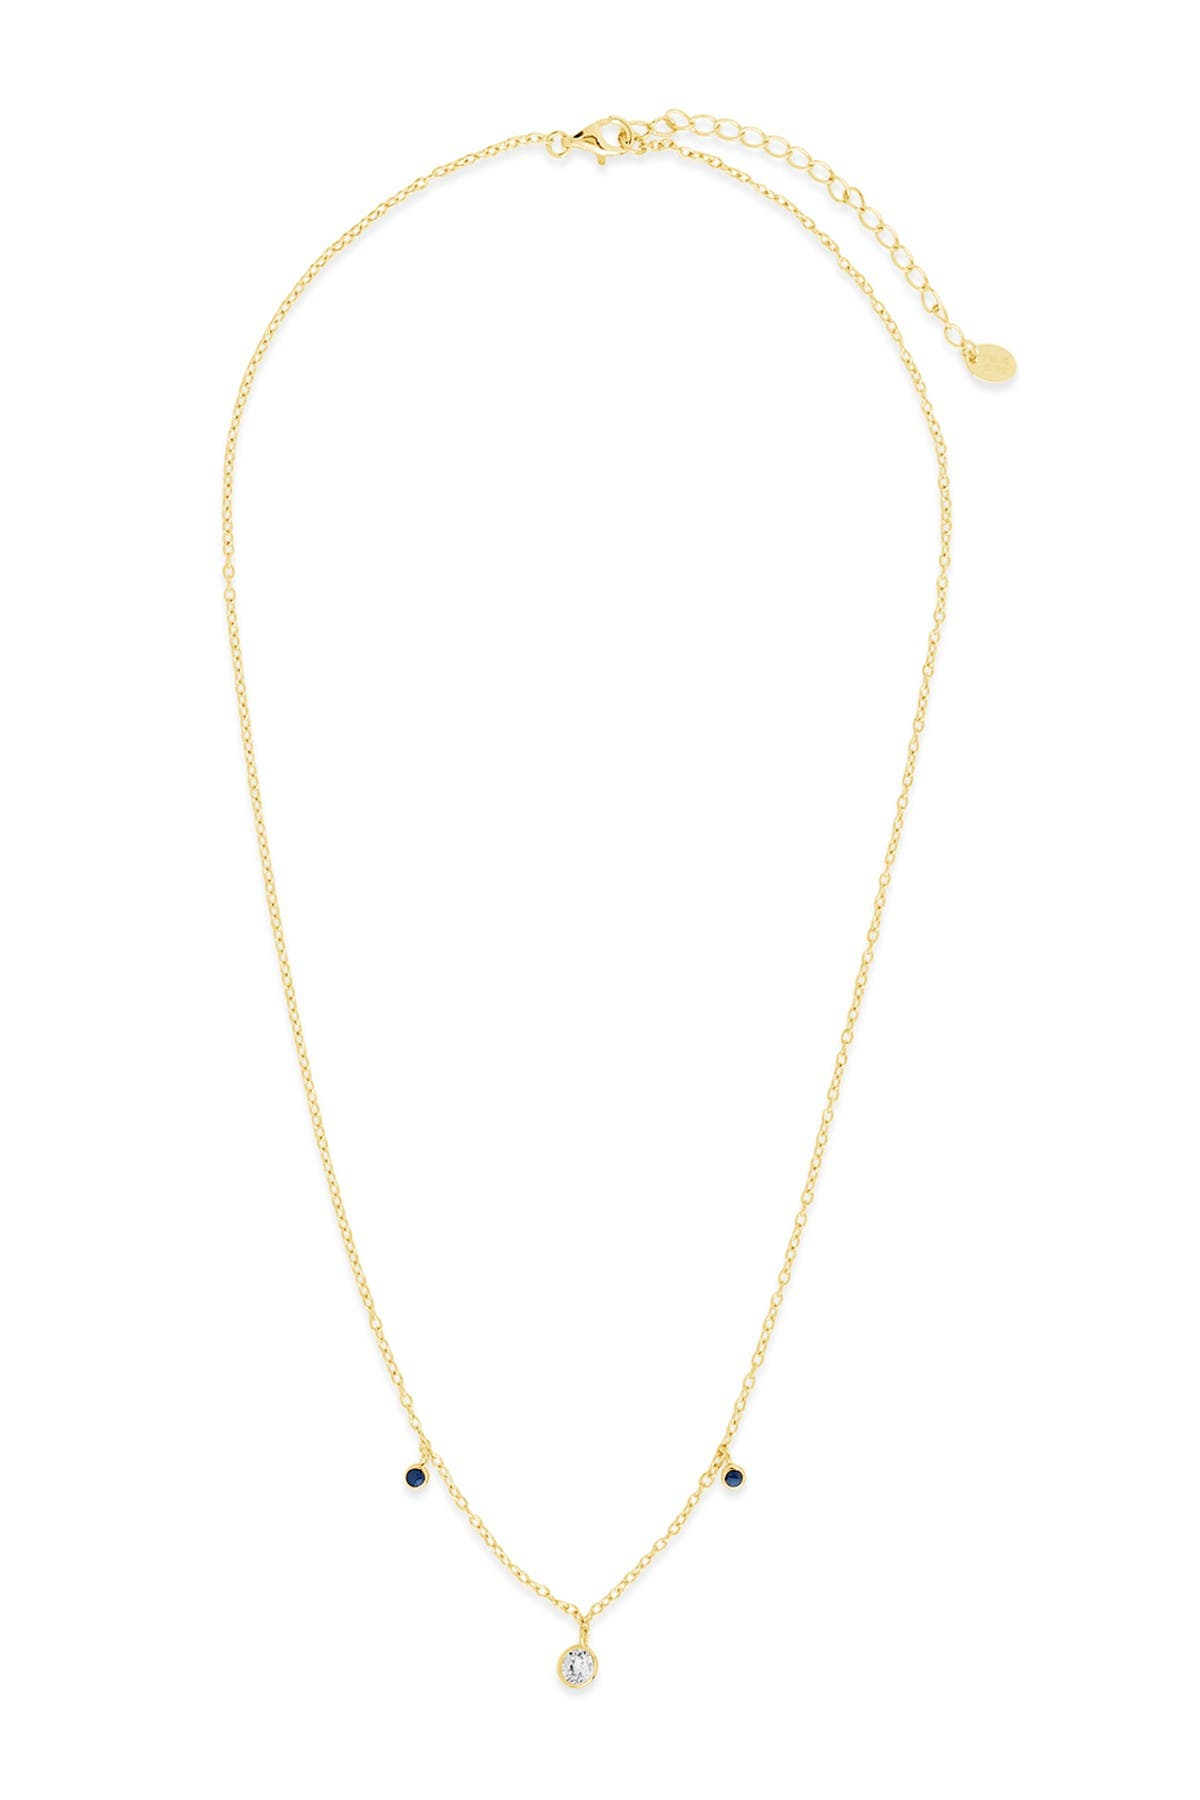 Image of Sterling Forever 14K Gold Vermeil Plated Sterling Silver Blue Enamel & CZ Charm Necklace